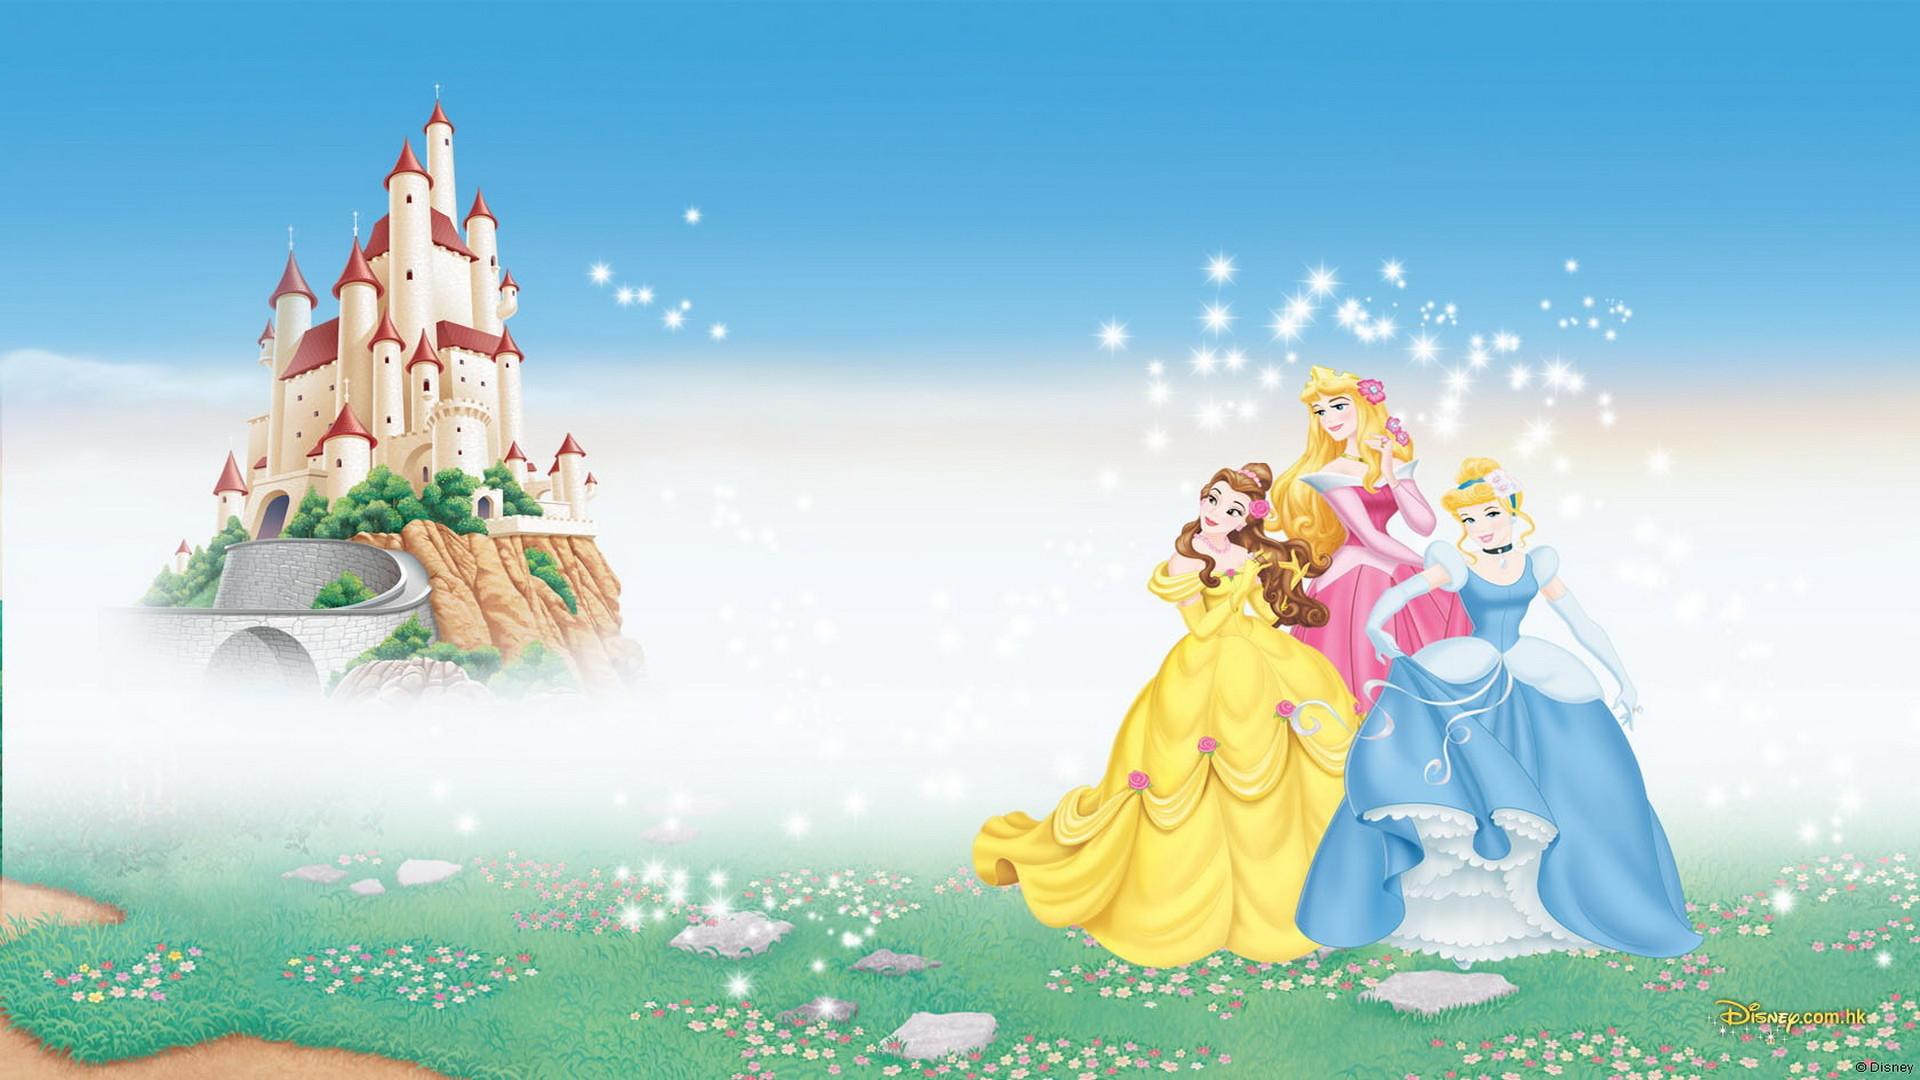 Res: 1920x1080, High Resolution Disney Princess Full HD Wallpaper Full Size ... - HD  Wallpapers